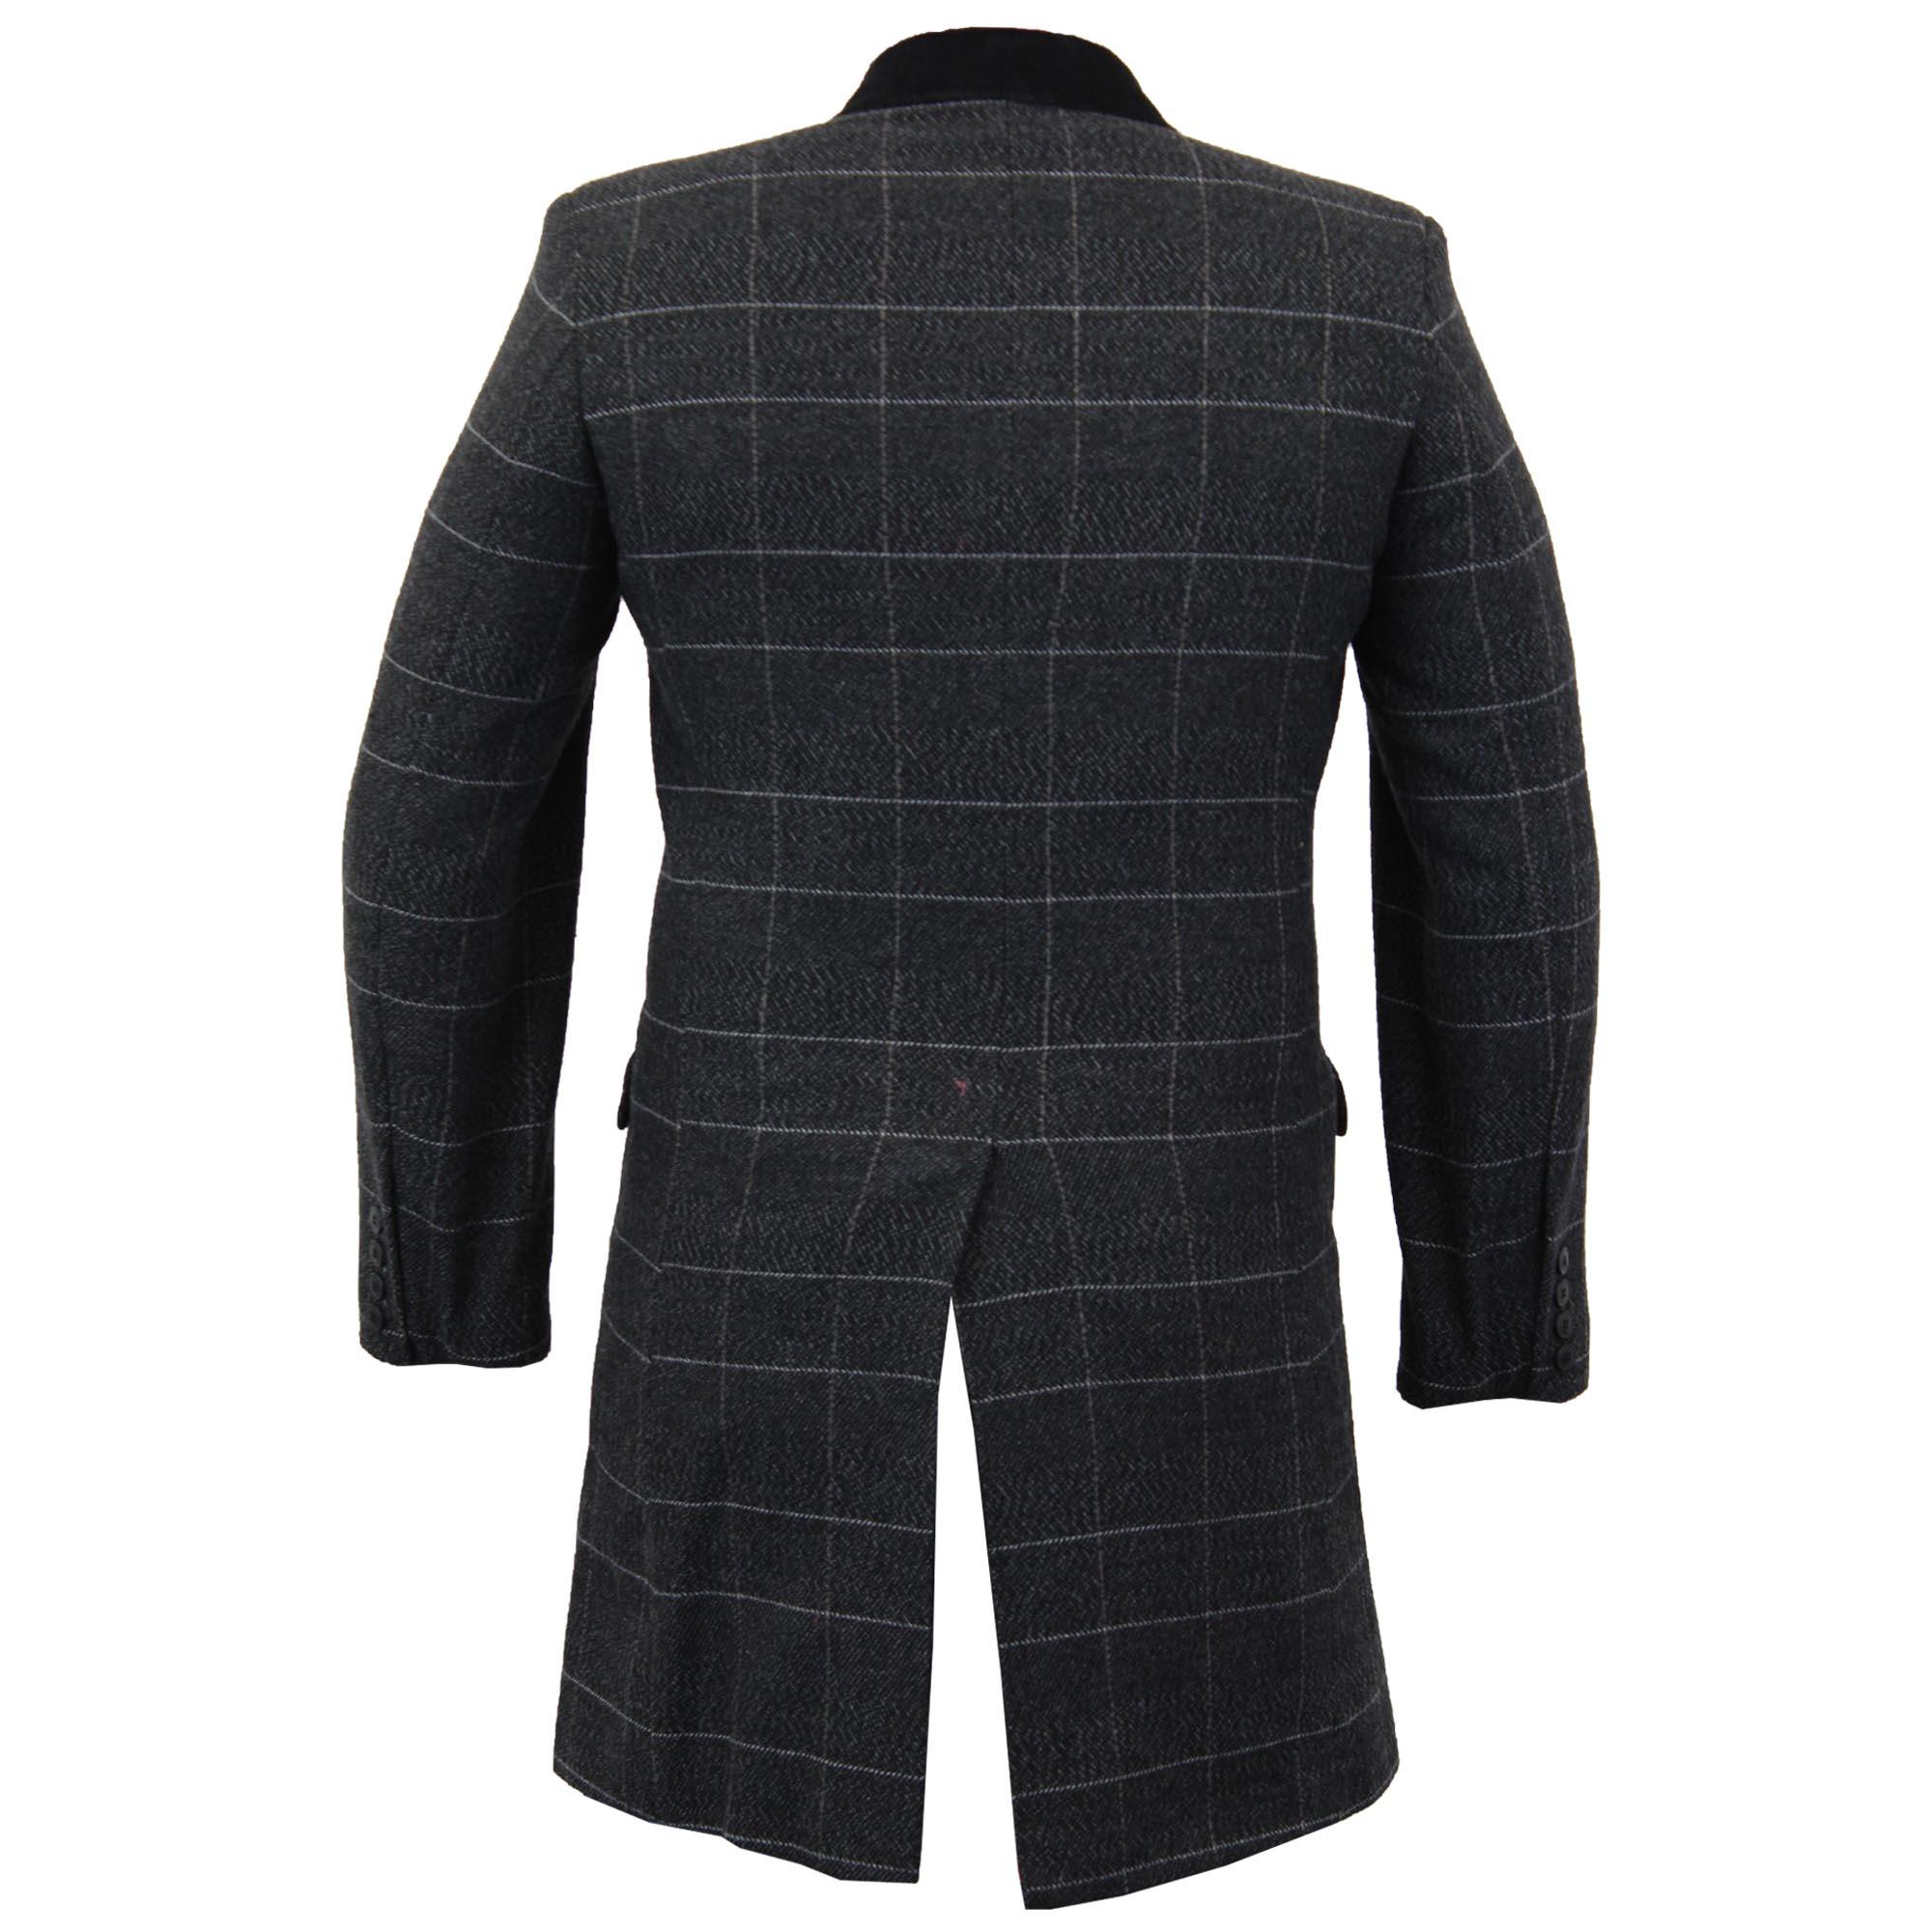 Mens-Wool-Mix-Trench-Coat-Checked-Jacket-Herringbone-Tweed-Overcoat-Lined-Winter thumbnail 3